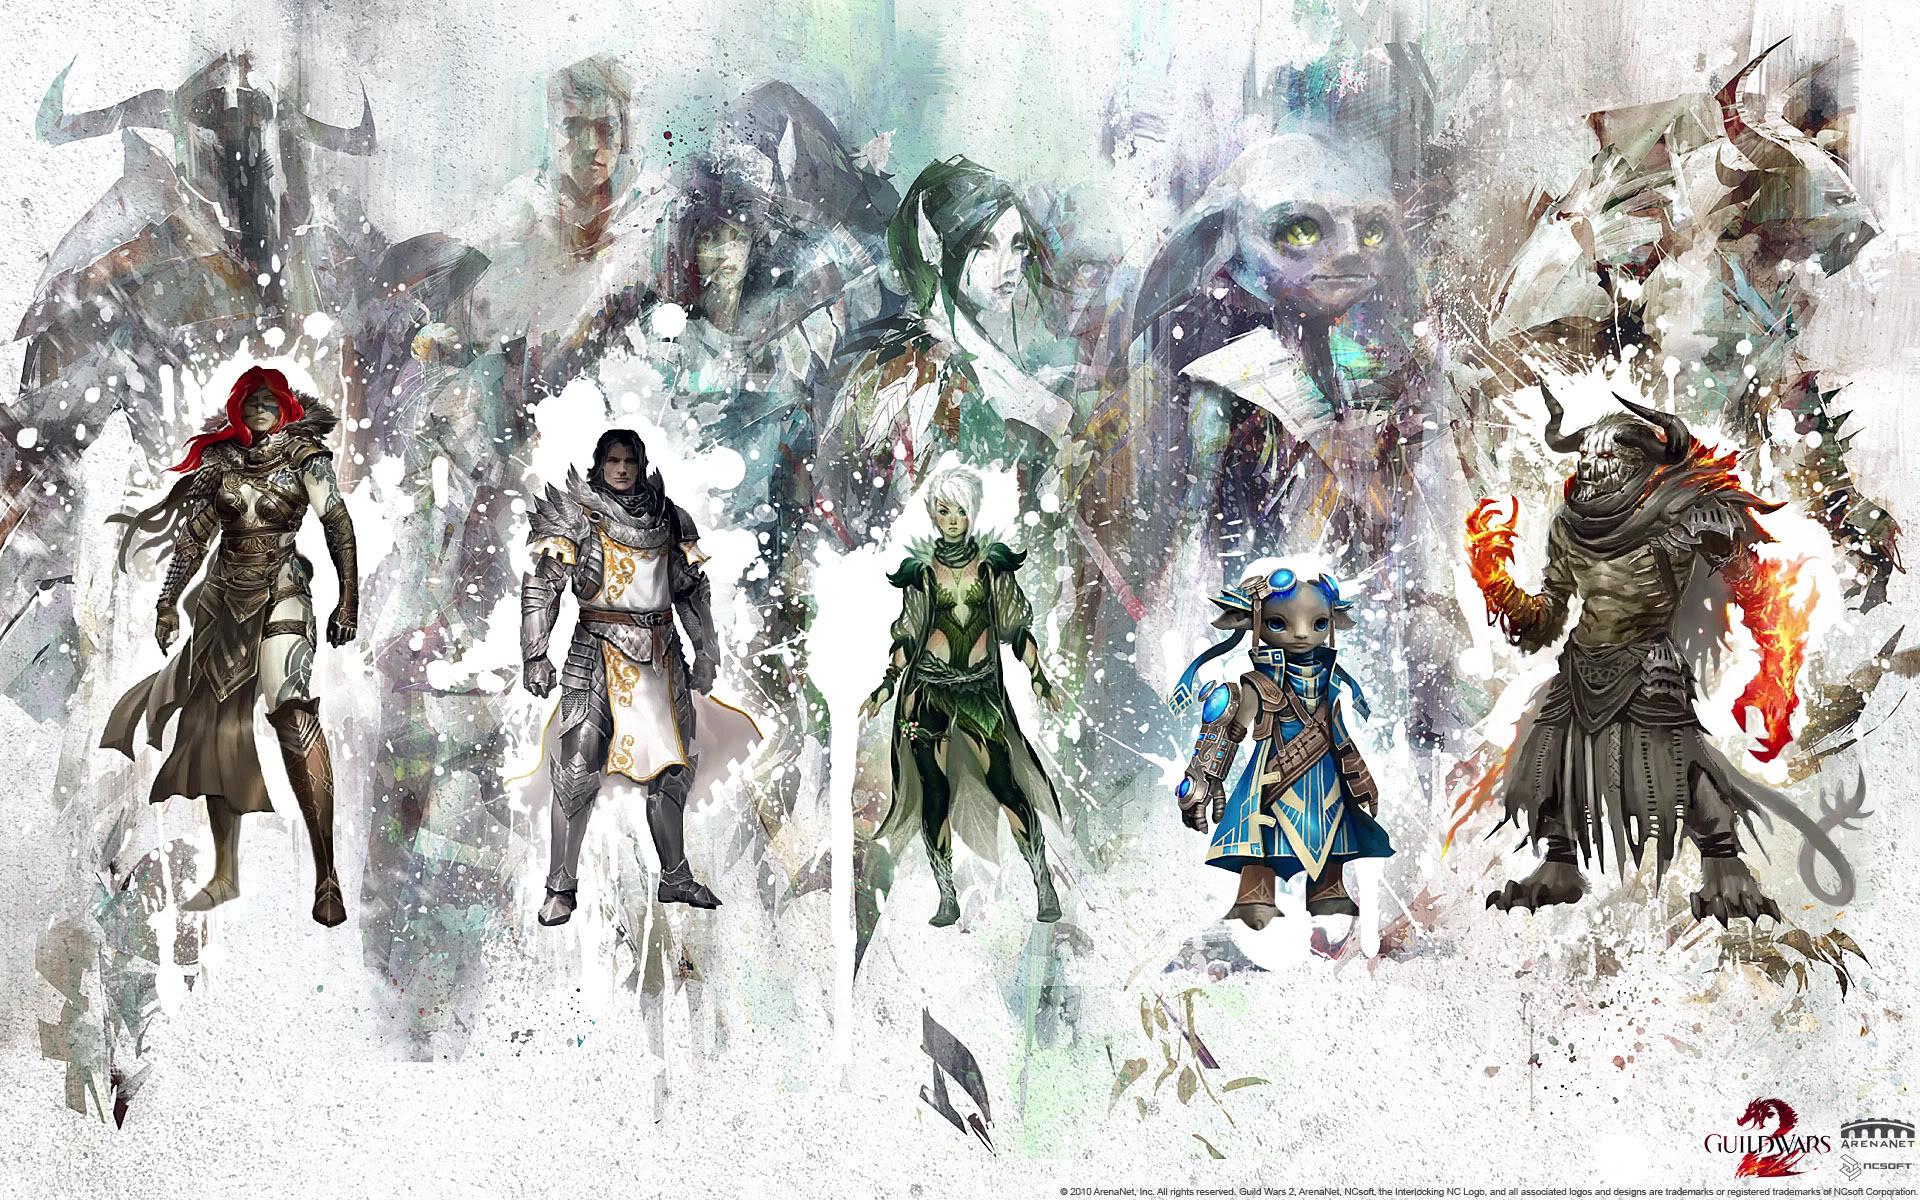 Guild wars 2 clipart hd.